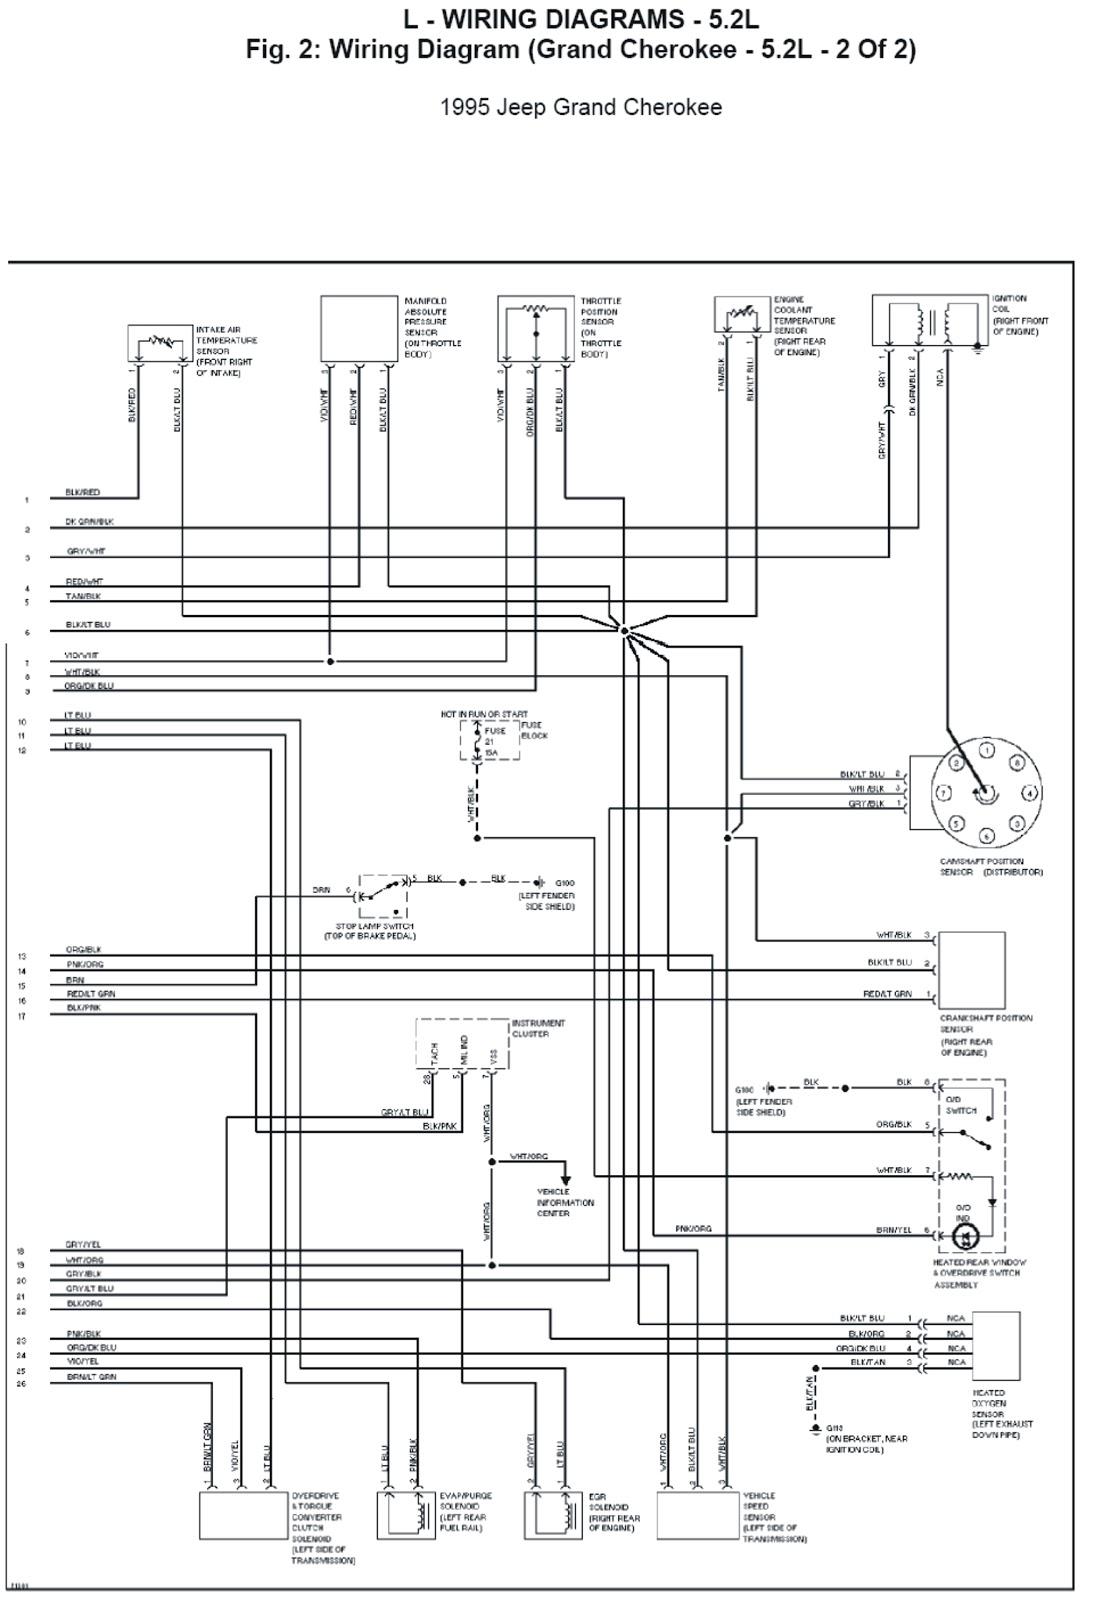 100 Keyless Entry Remote Start Wiring Diagram – Jeep Grand Cherokee Remote Start Wiring Diagram